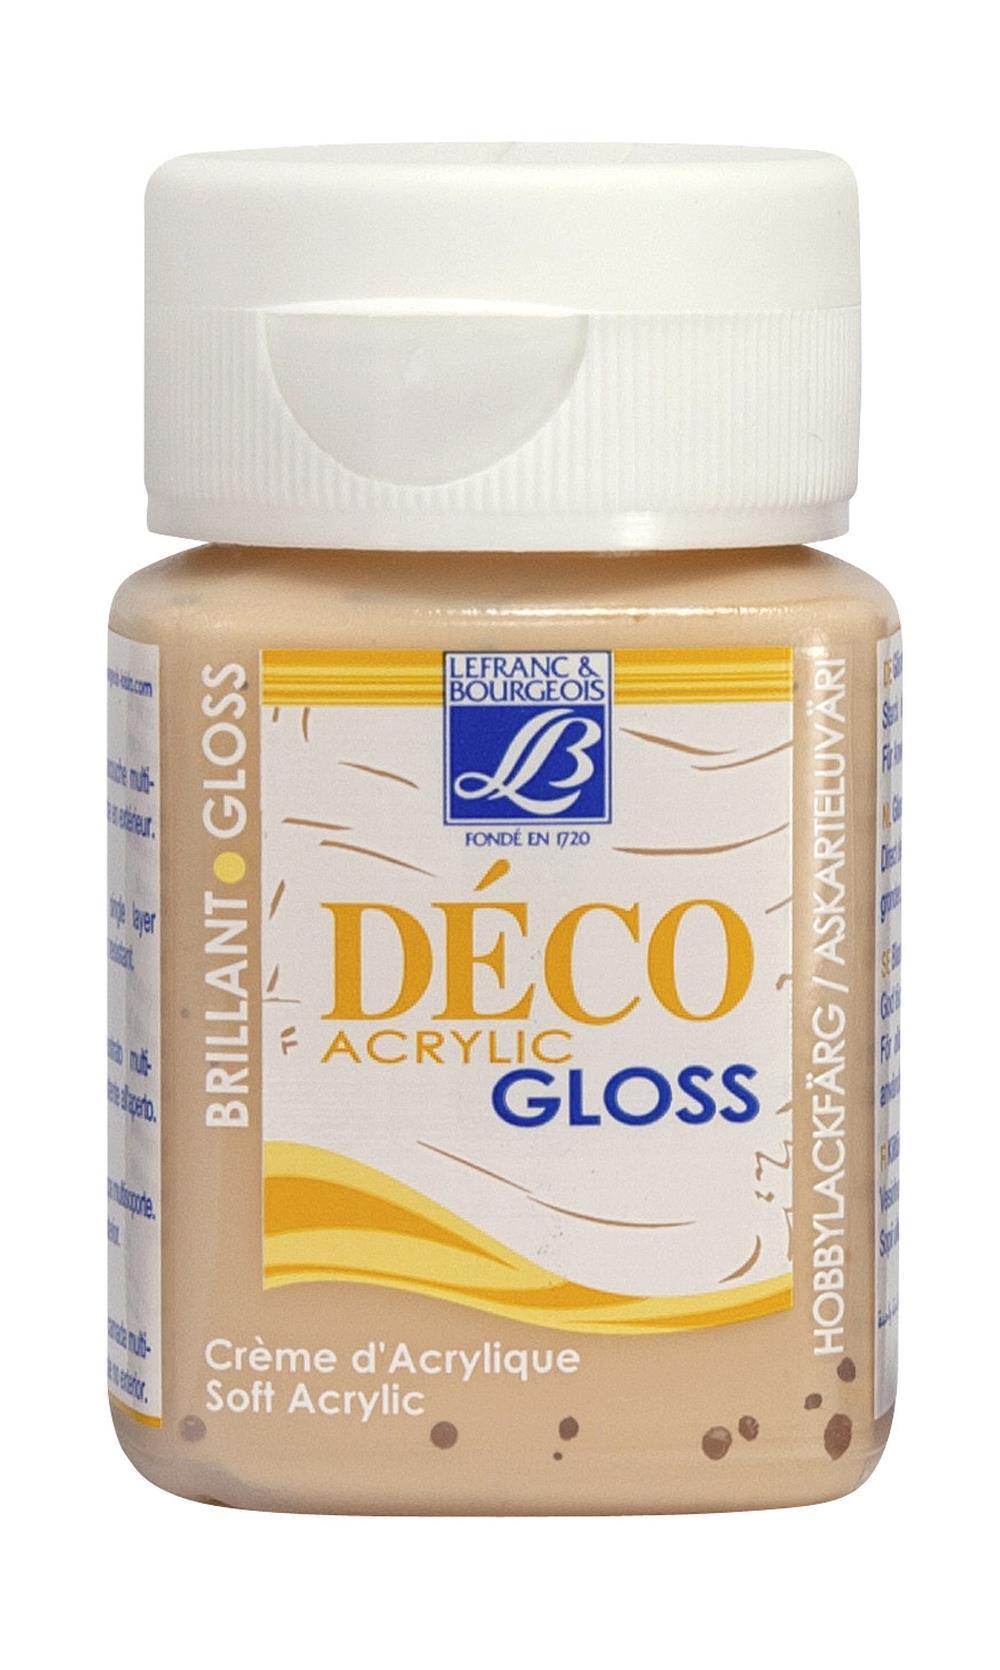 Hobbyfärg L&B Deco Gloss Akryl 50ml  Light peach 454 (4F) Utgår